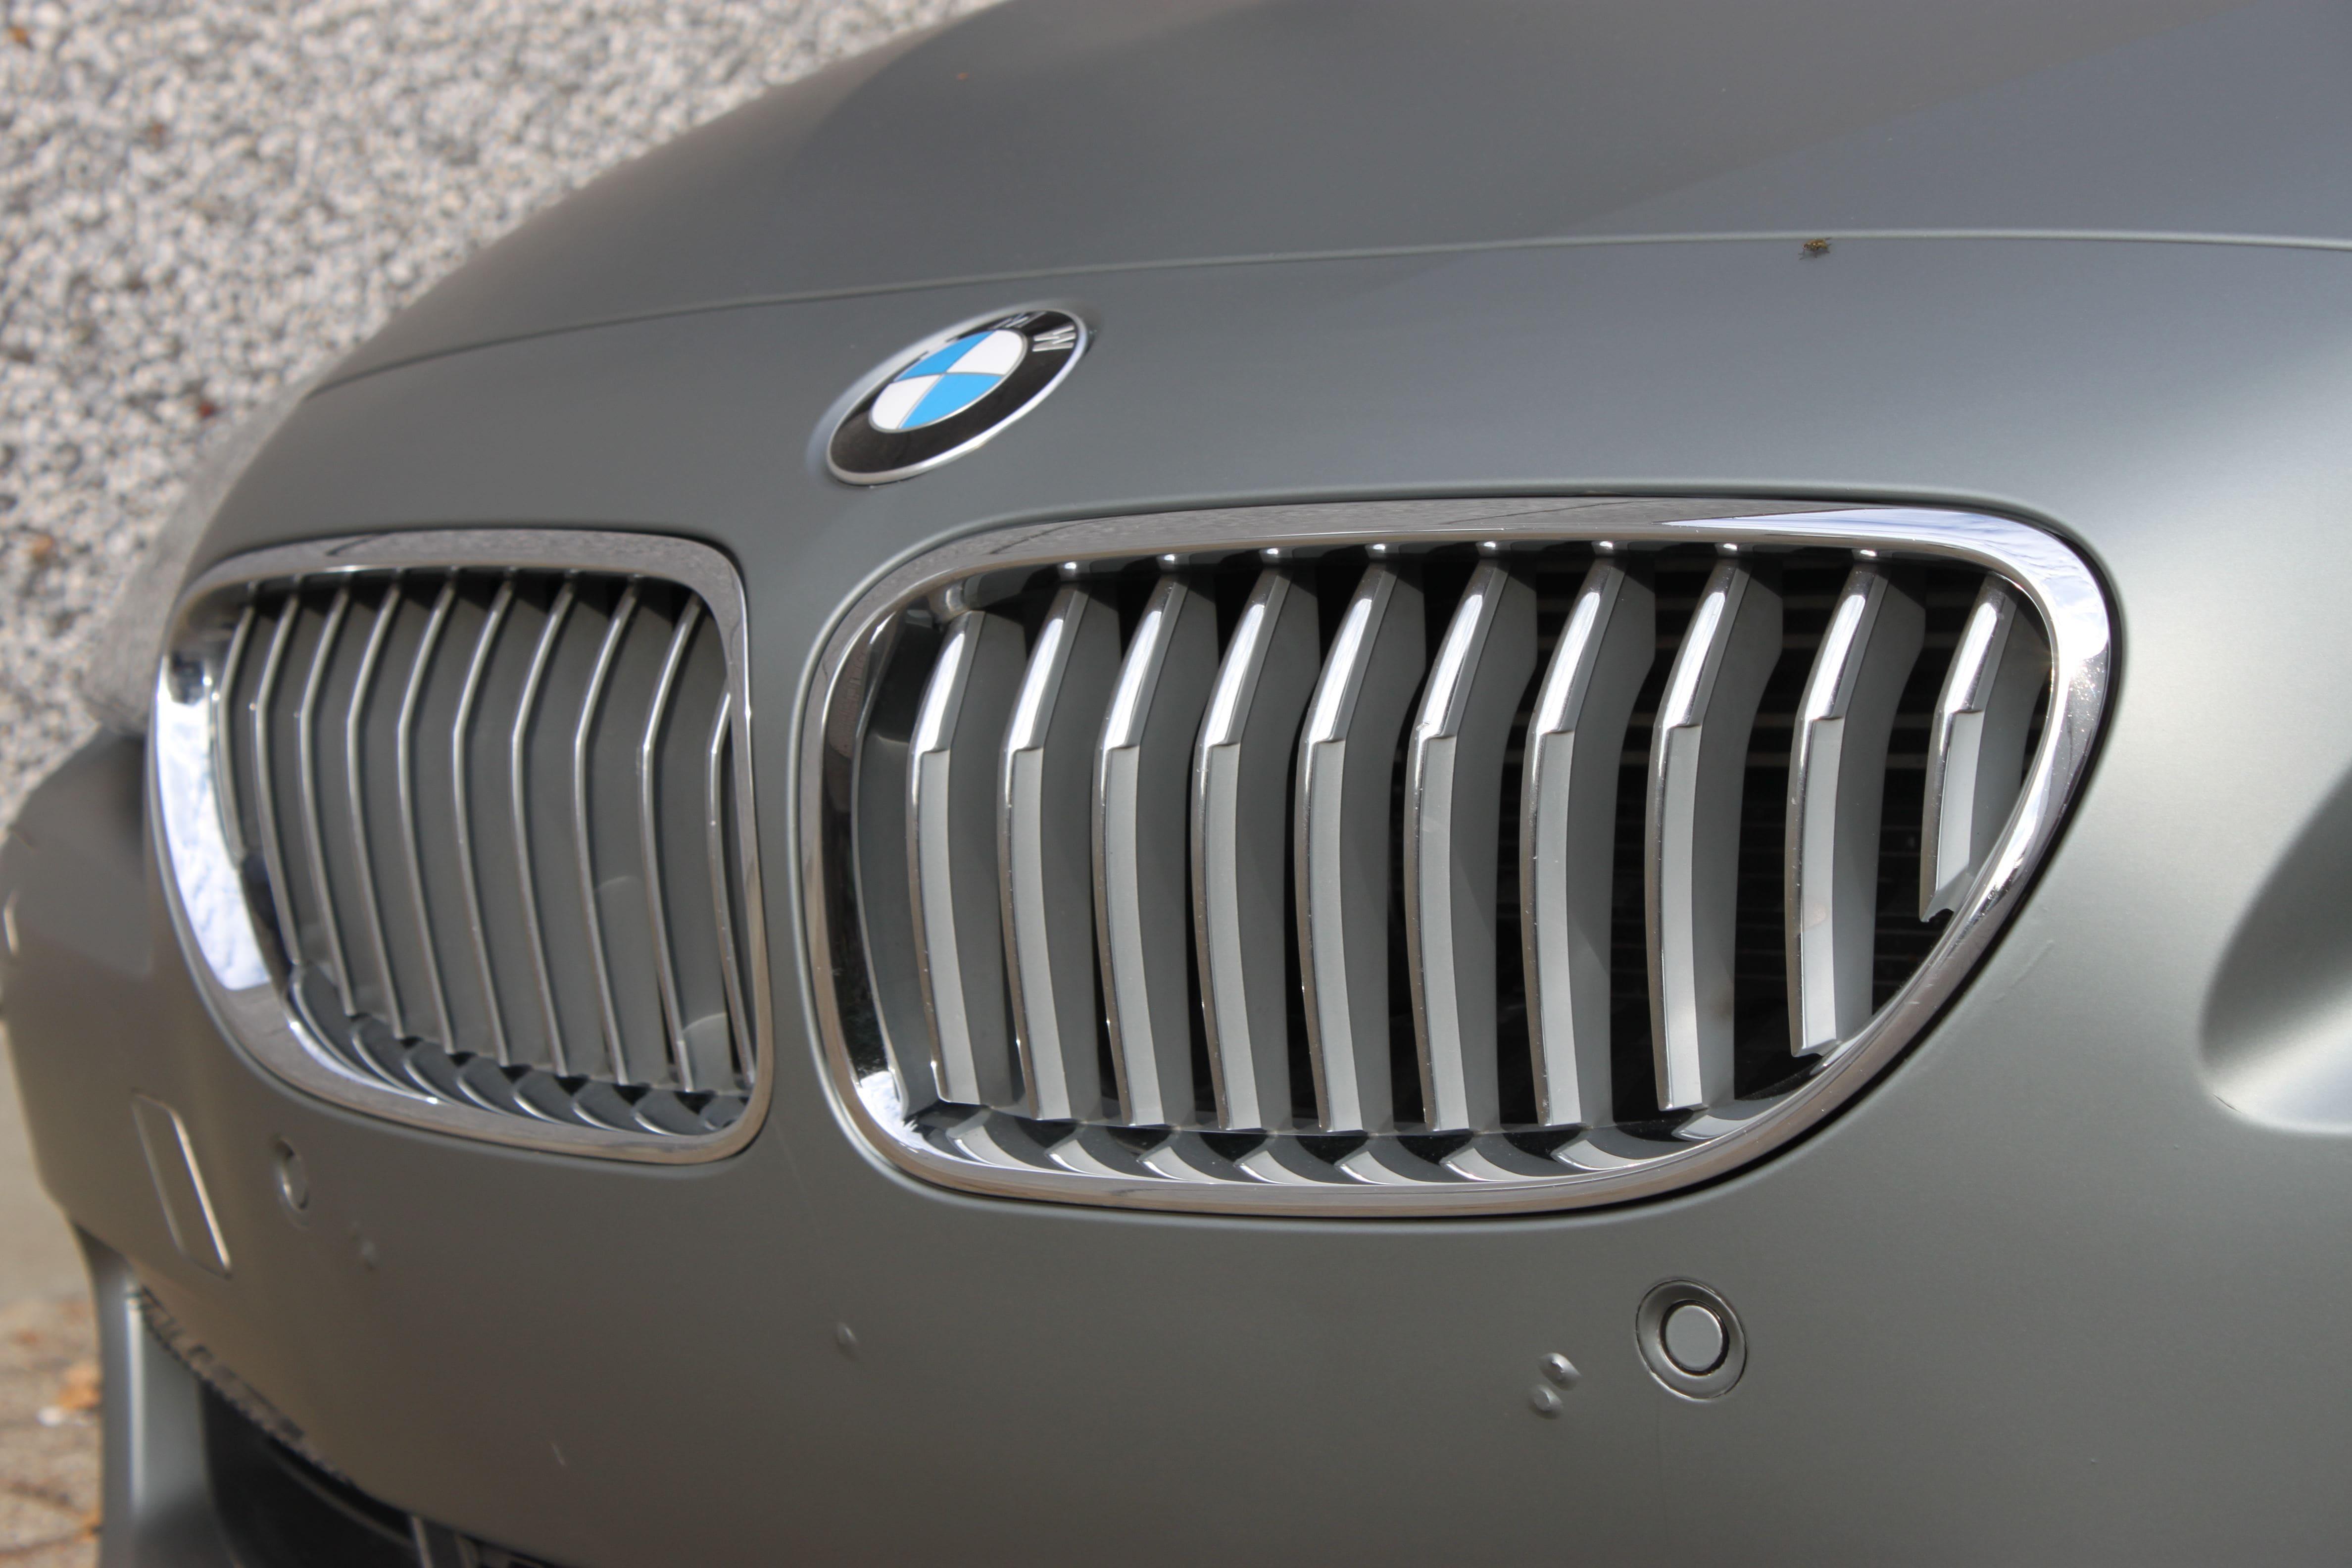 BMW 650i met Mat Antraciet Metallic Avery Wrap, Carwrapping door Wrapmyride.nu Foto-nr:5283, ©2020